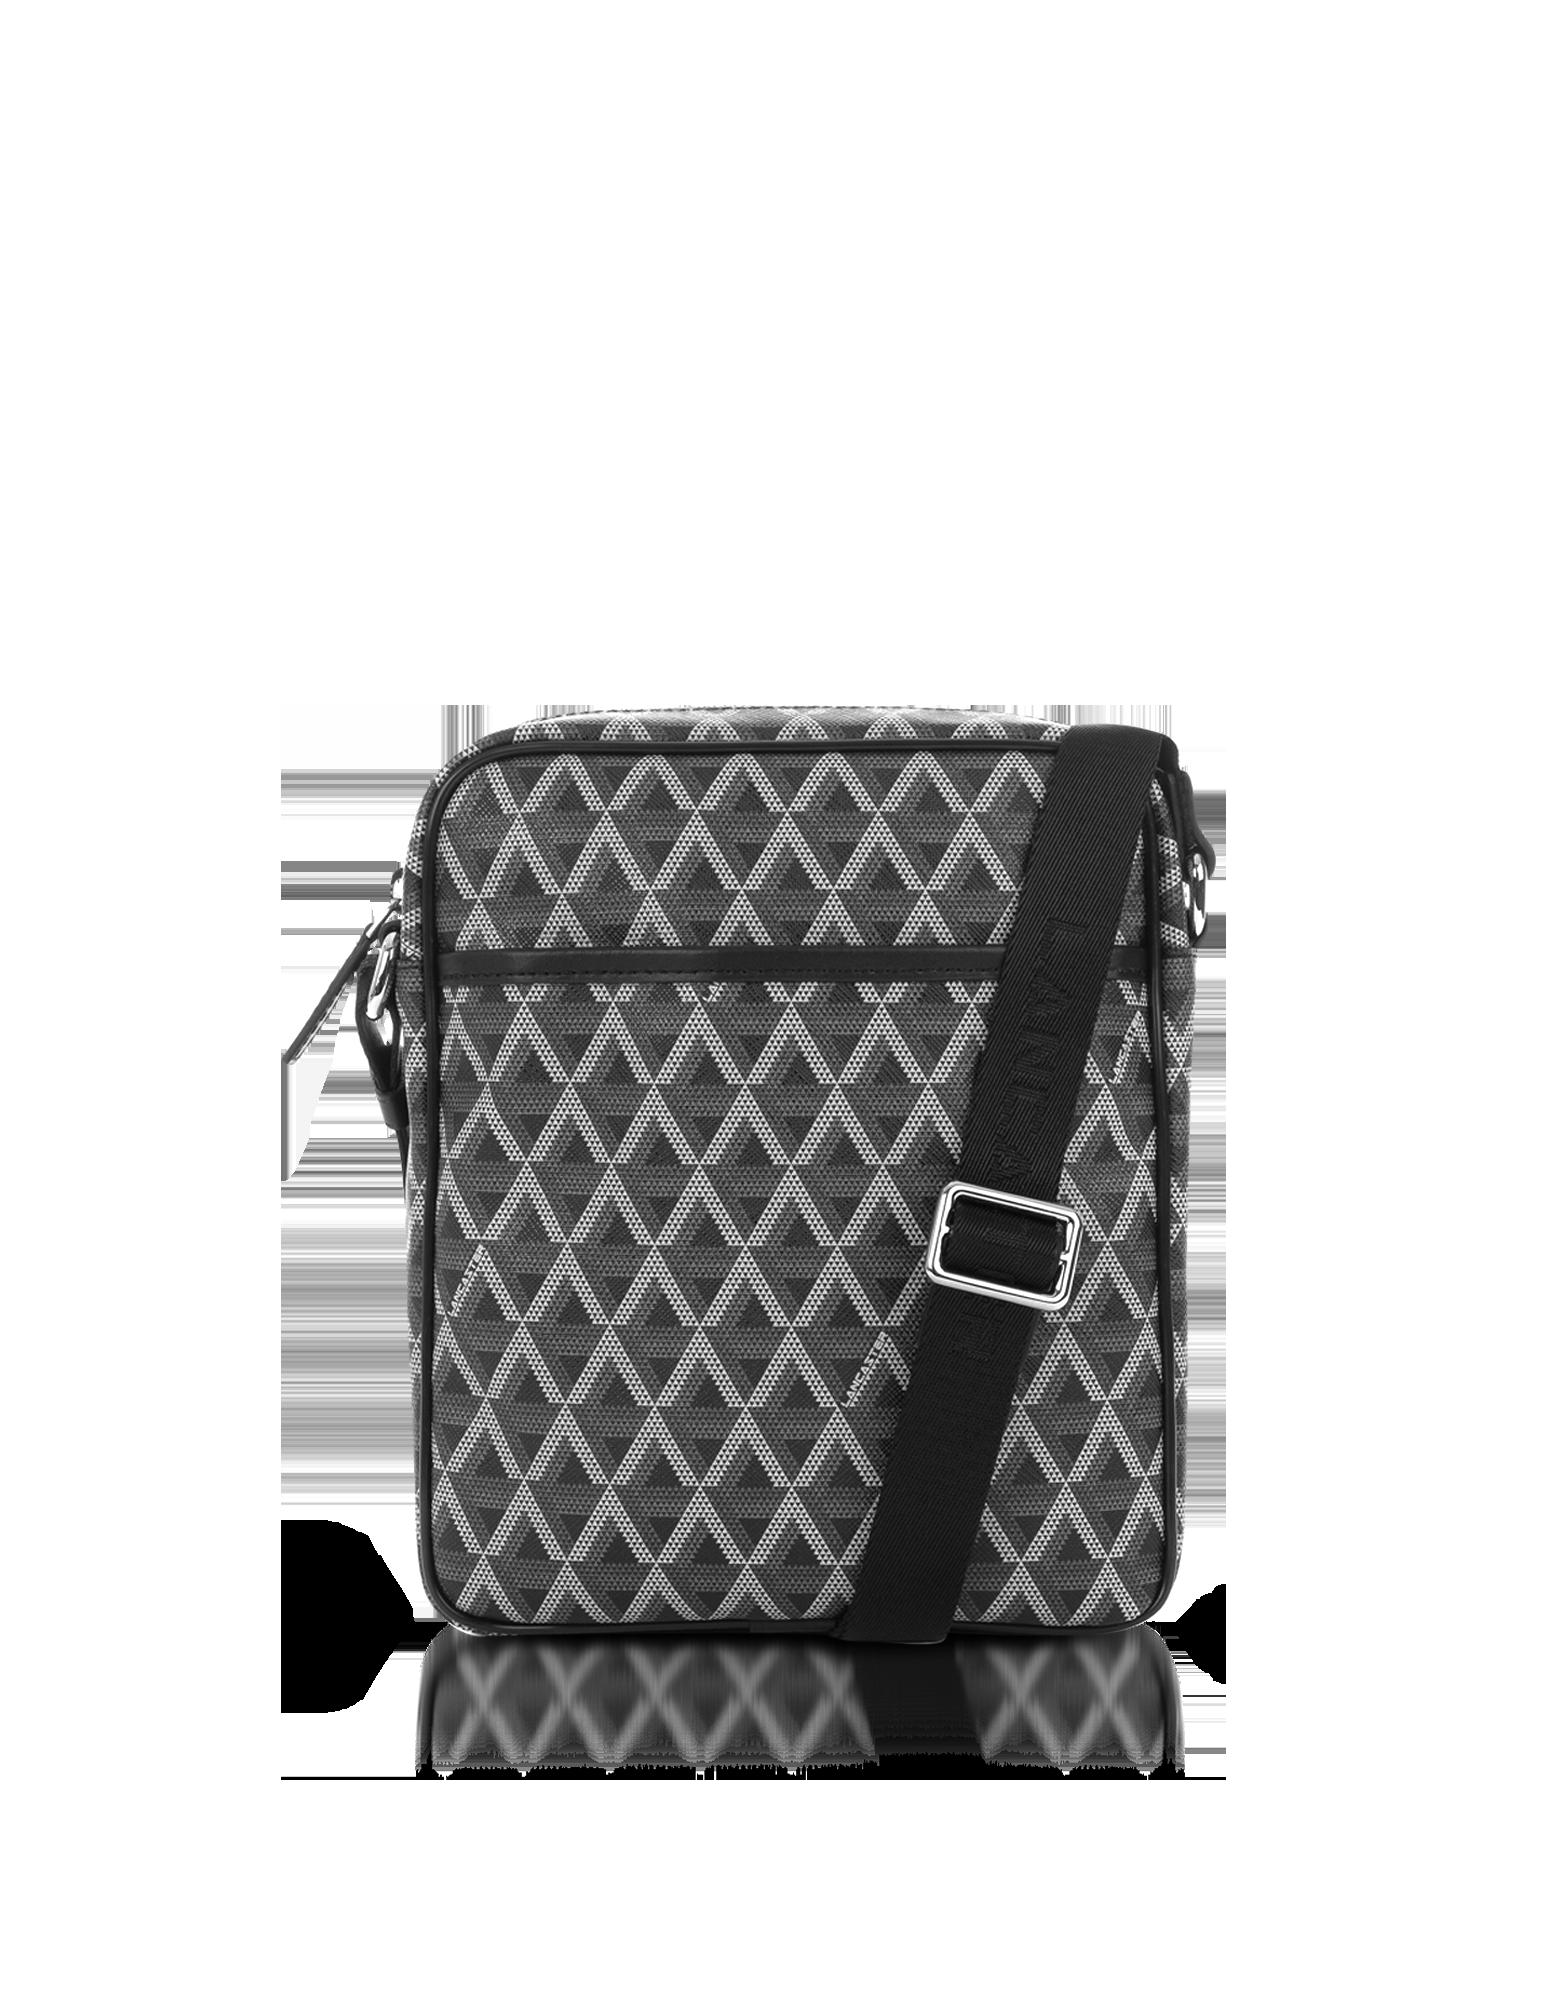 Image of Ikon Black Coated Canvas Men's Crossbody Bag